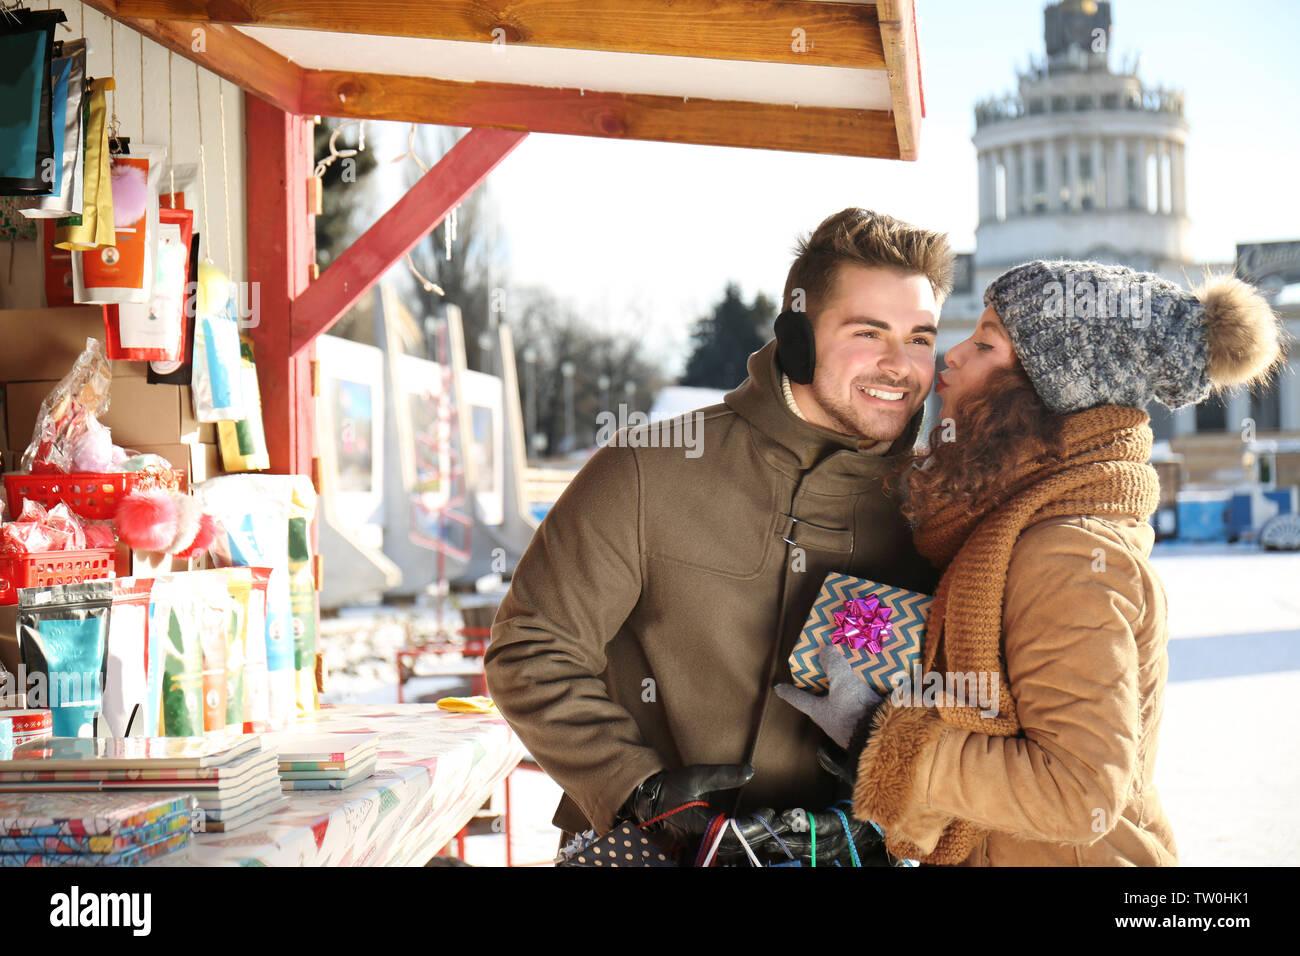 Man presenting gift to woman on Christmas market - Stock Image